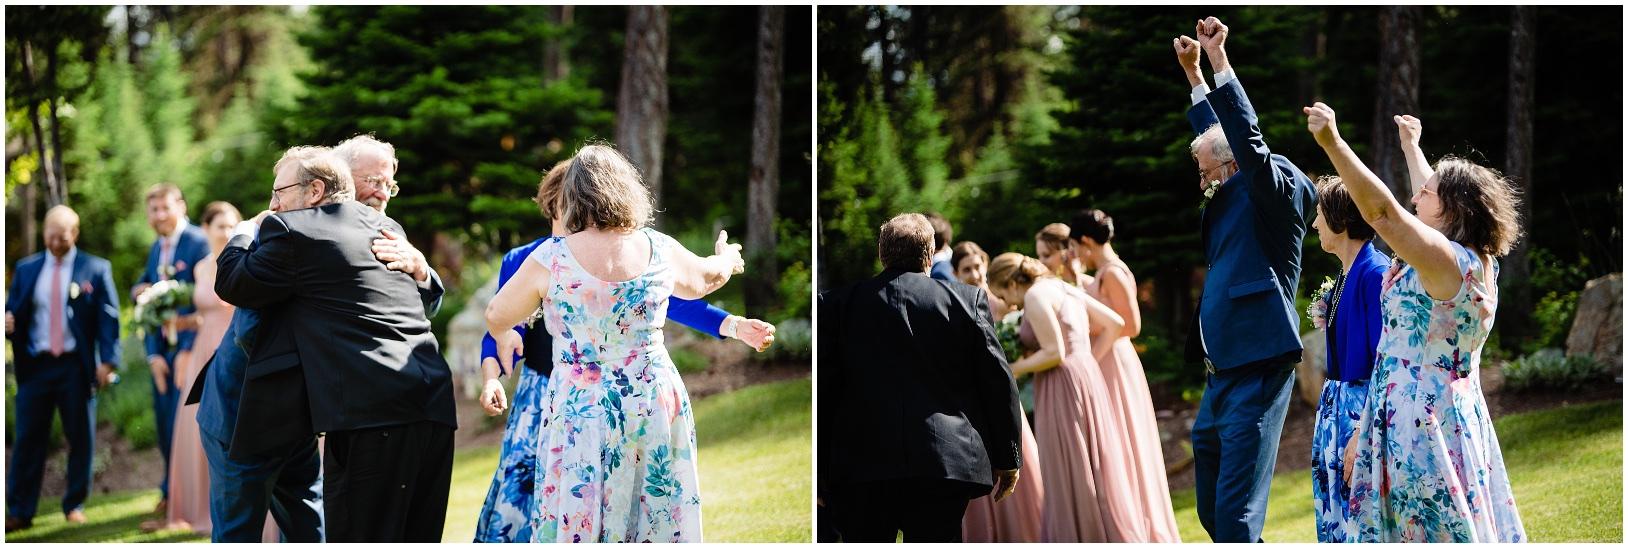 lindseyjanephoto_wedding0082.jpg